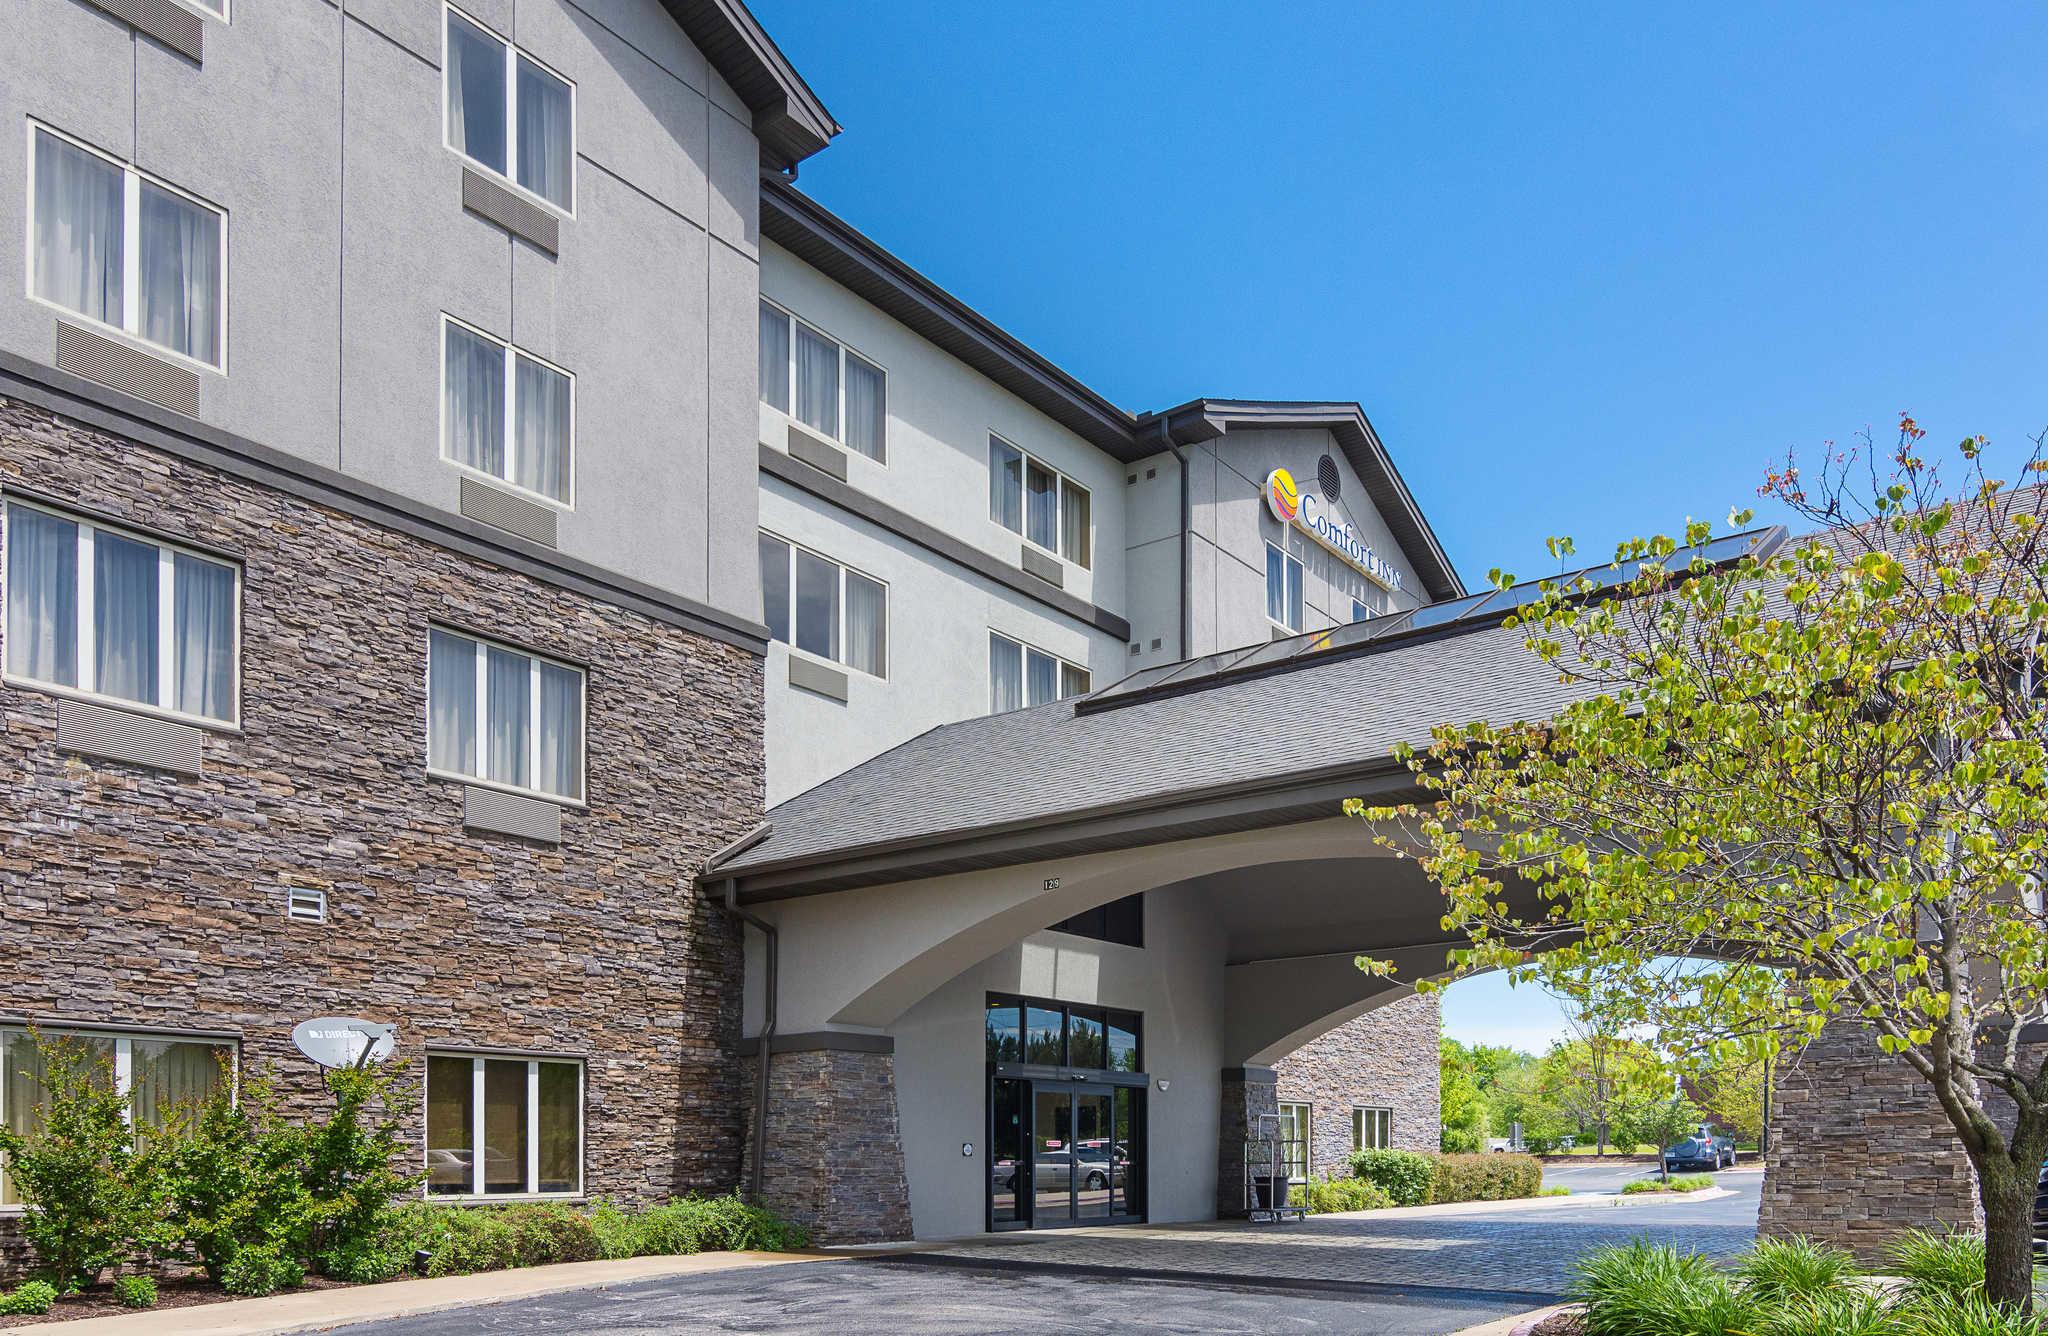 Bentonville Ar Hotels Near Crystal Bridges